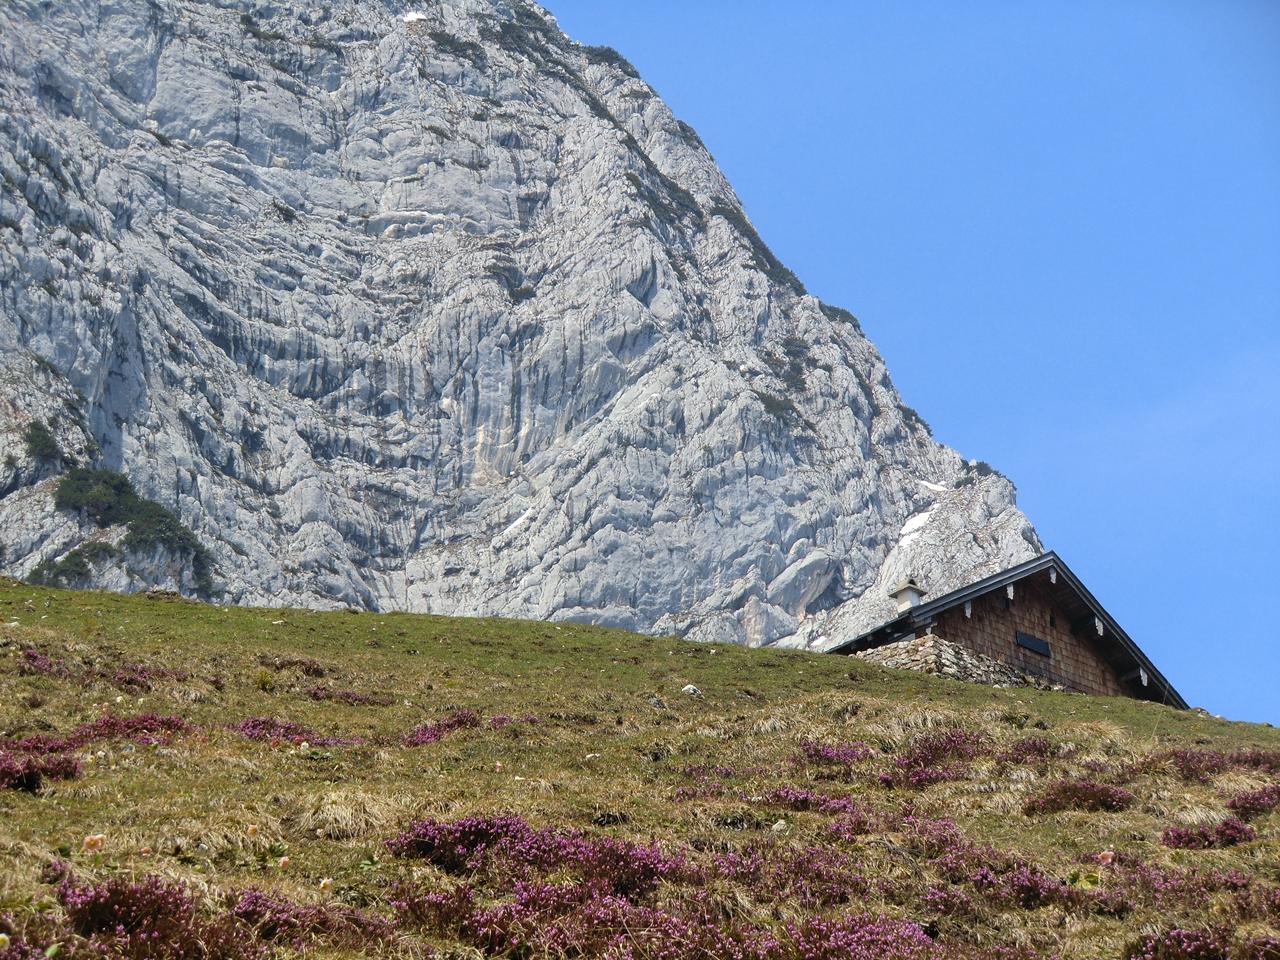 Klettersteig Untersberg : Untersberger klettersteig archive berchtesgadener land